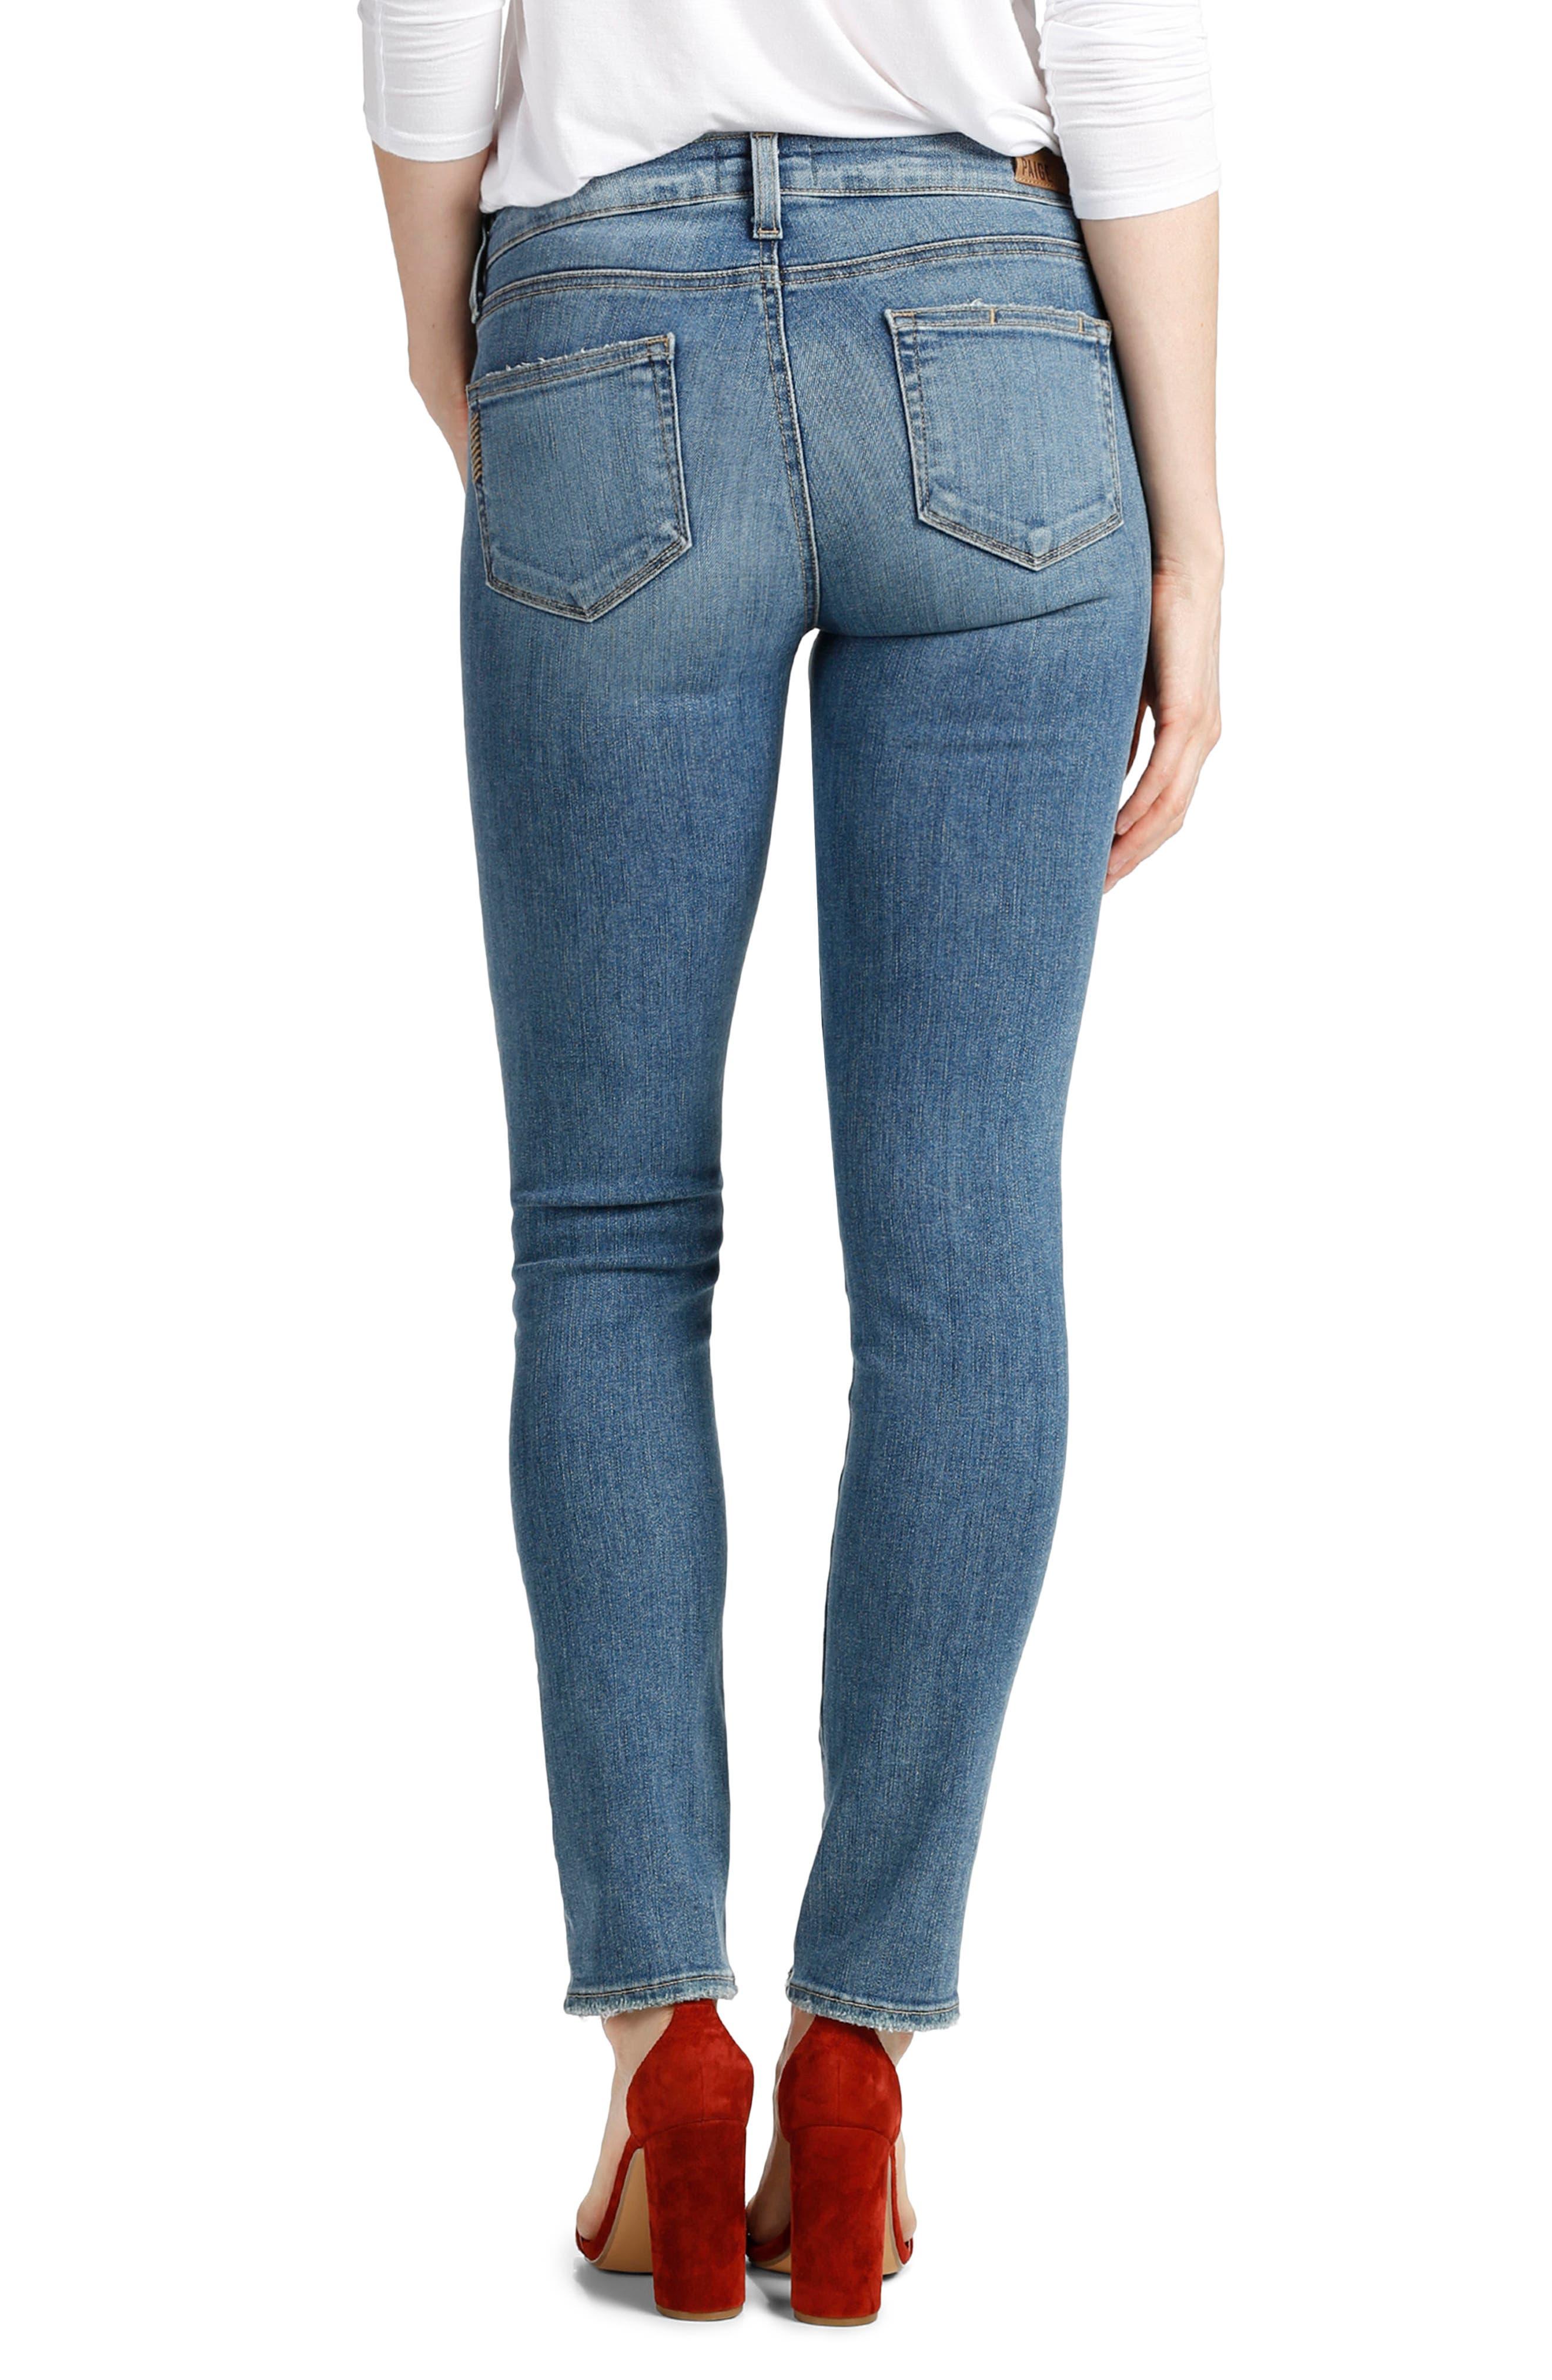 Transcend - Skyline Ankle Peg Skinny Jeans,                             Alternate thumbnail 2, color,                             400